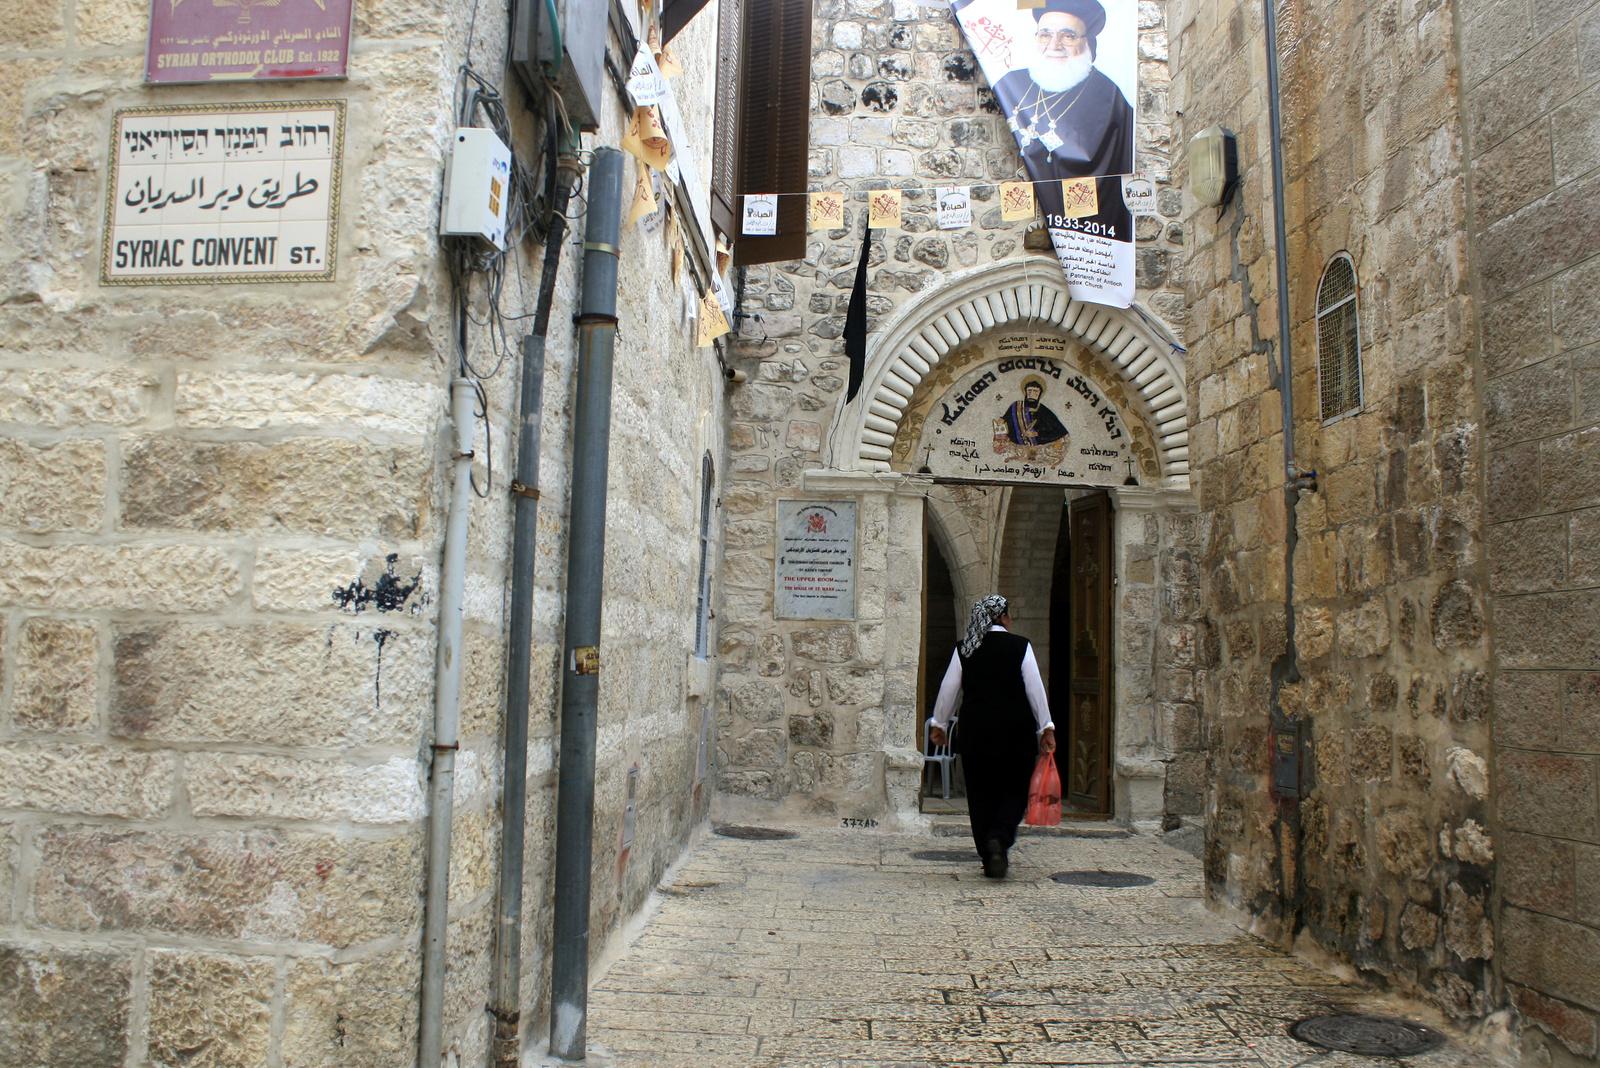 Syriac convent